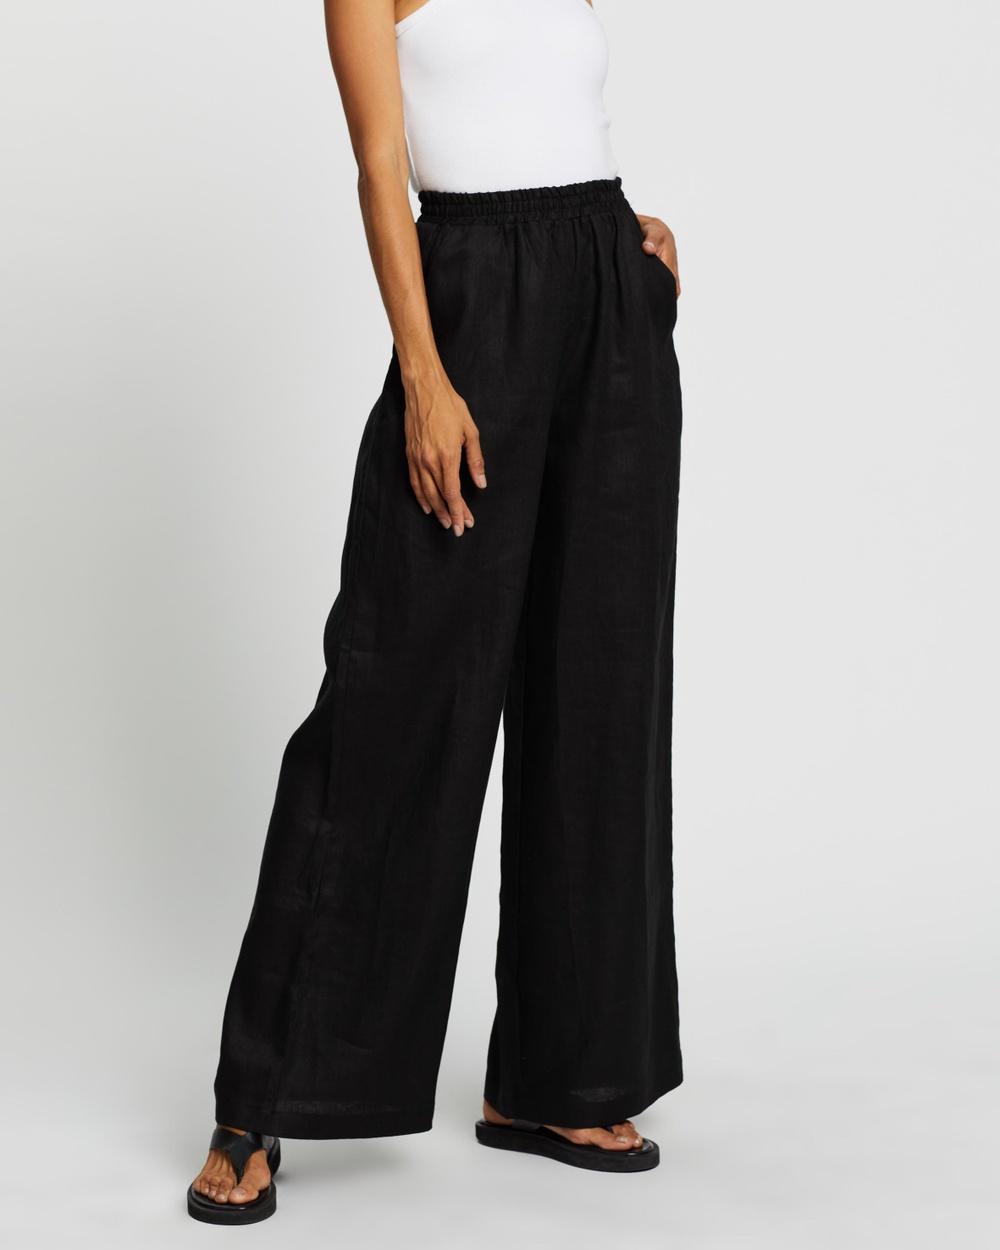 AERE Linen Wide Leg Pants Black